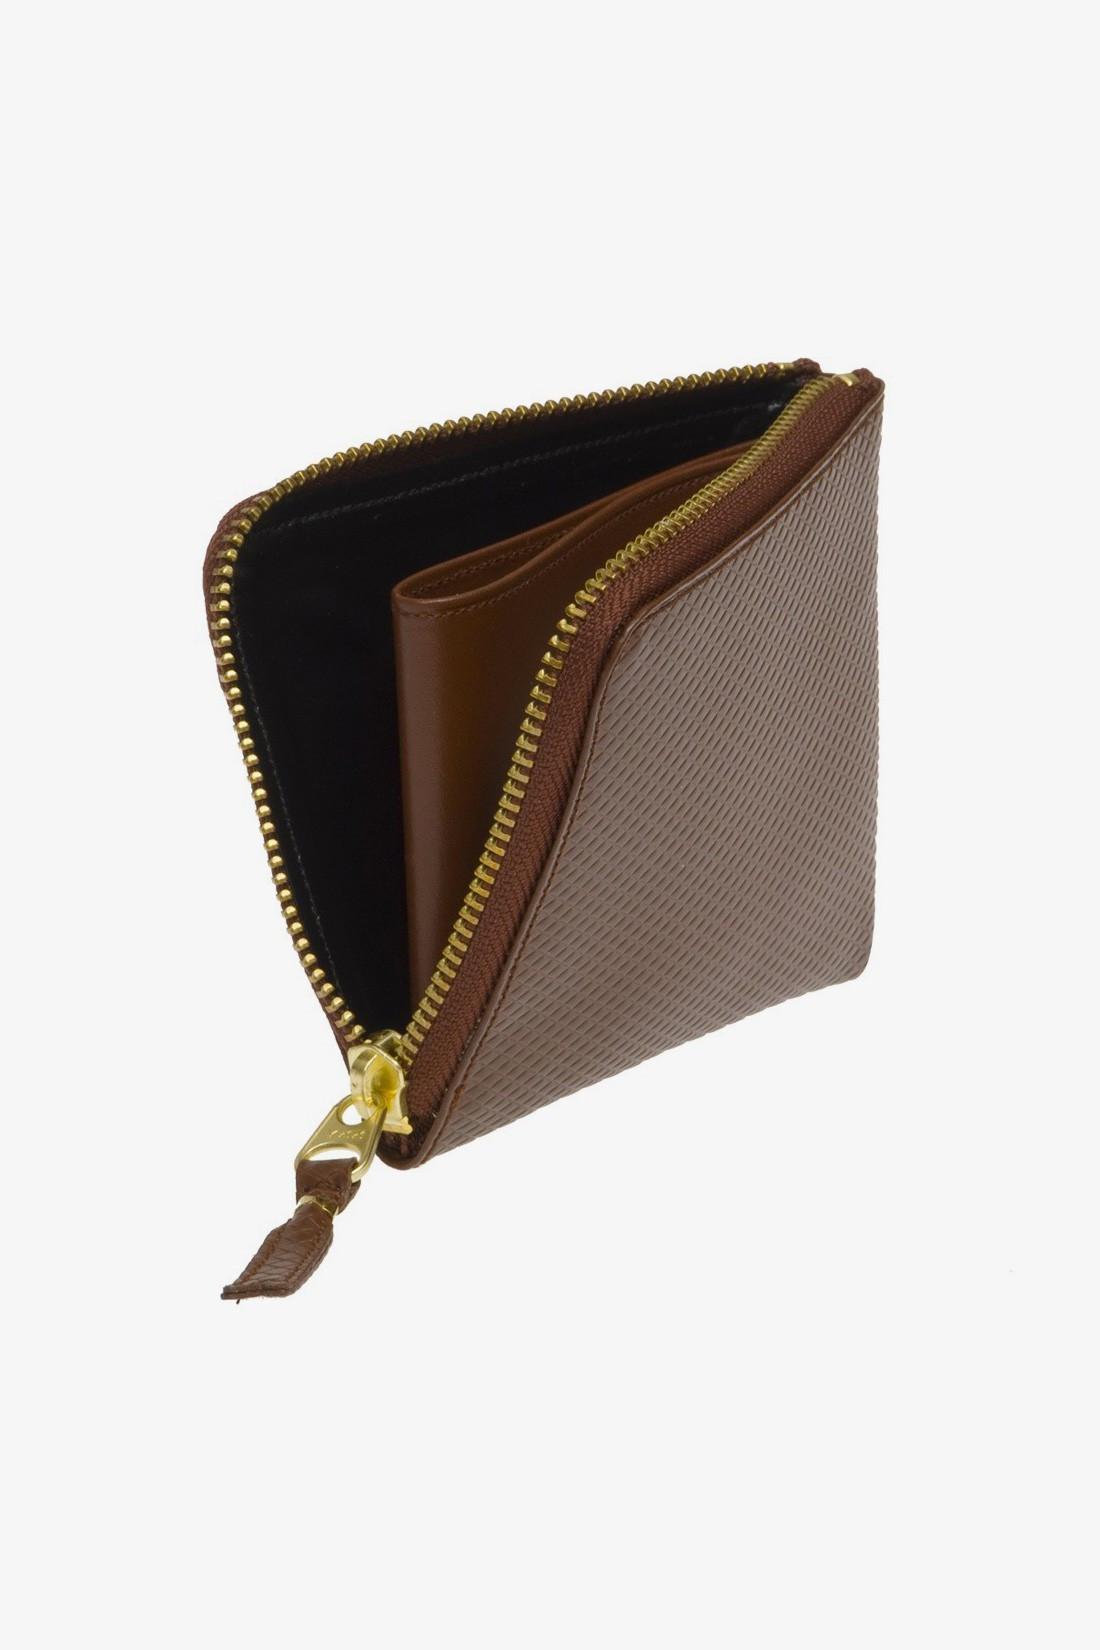 CDG WALLETS / Cdg luxury group 3100lg Brown